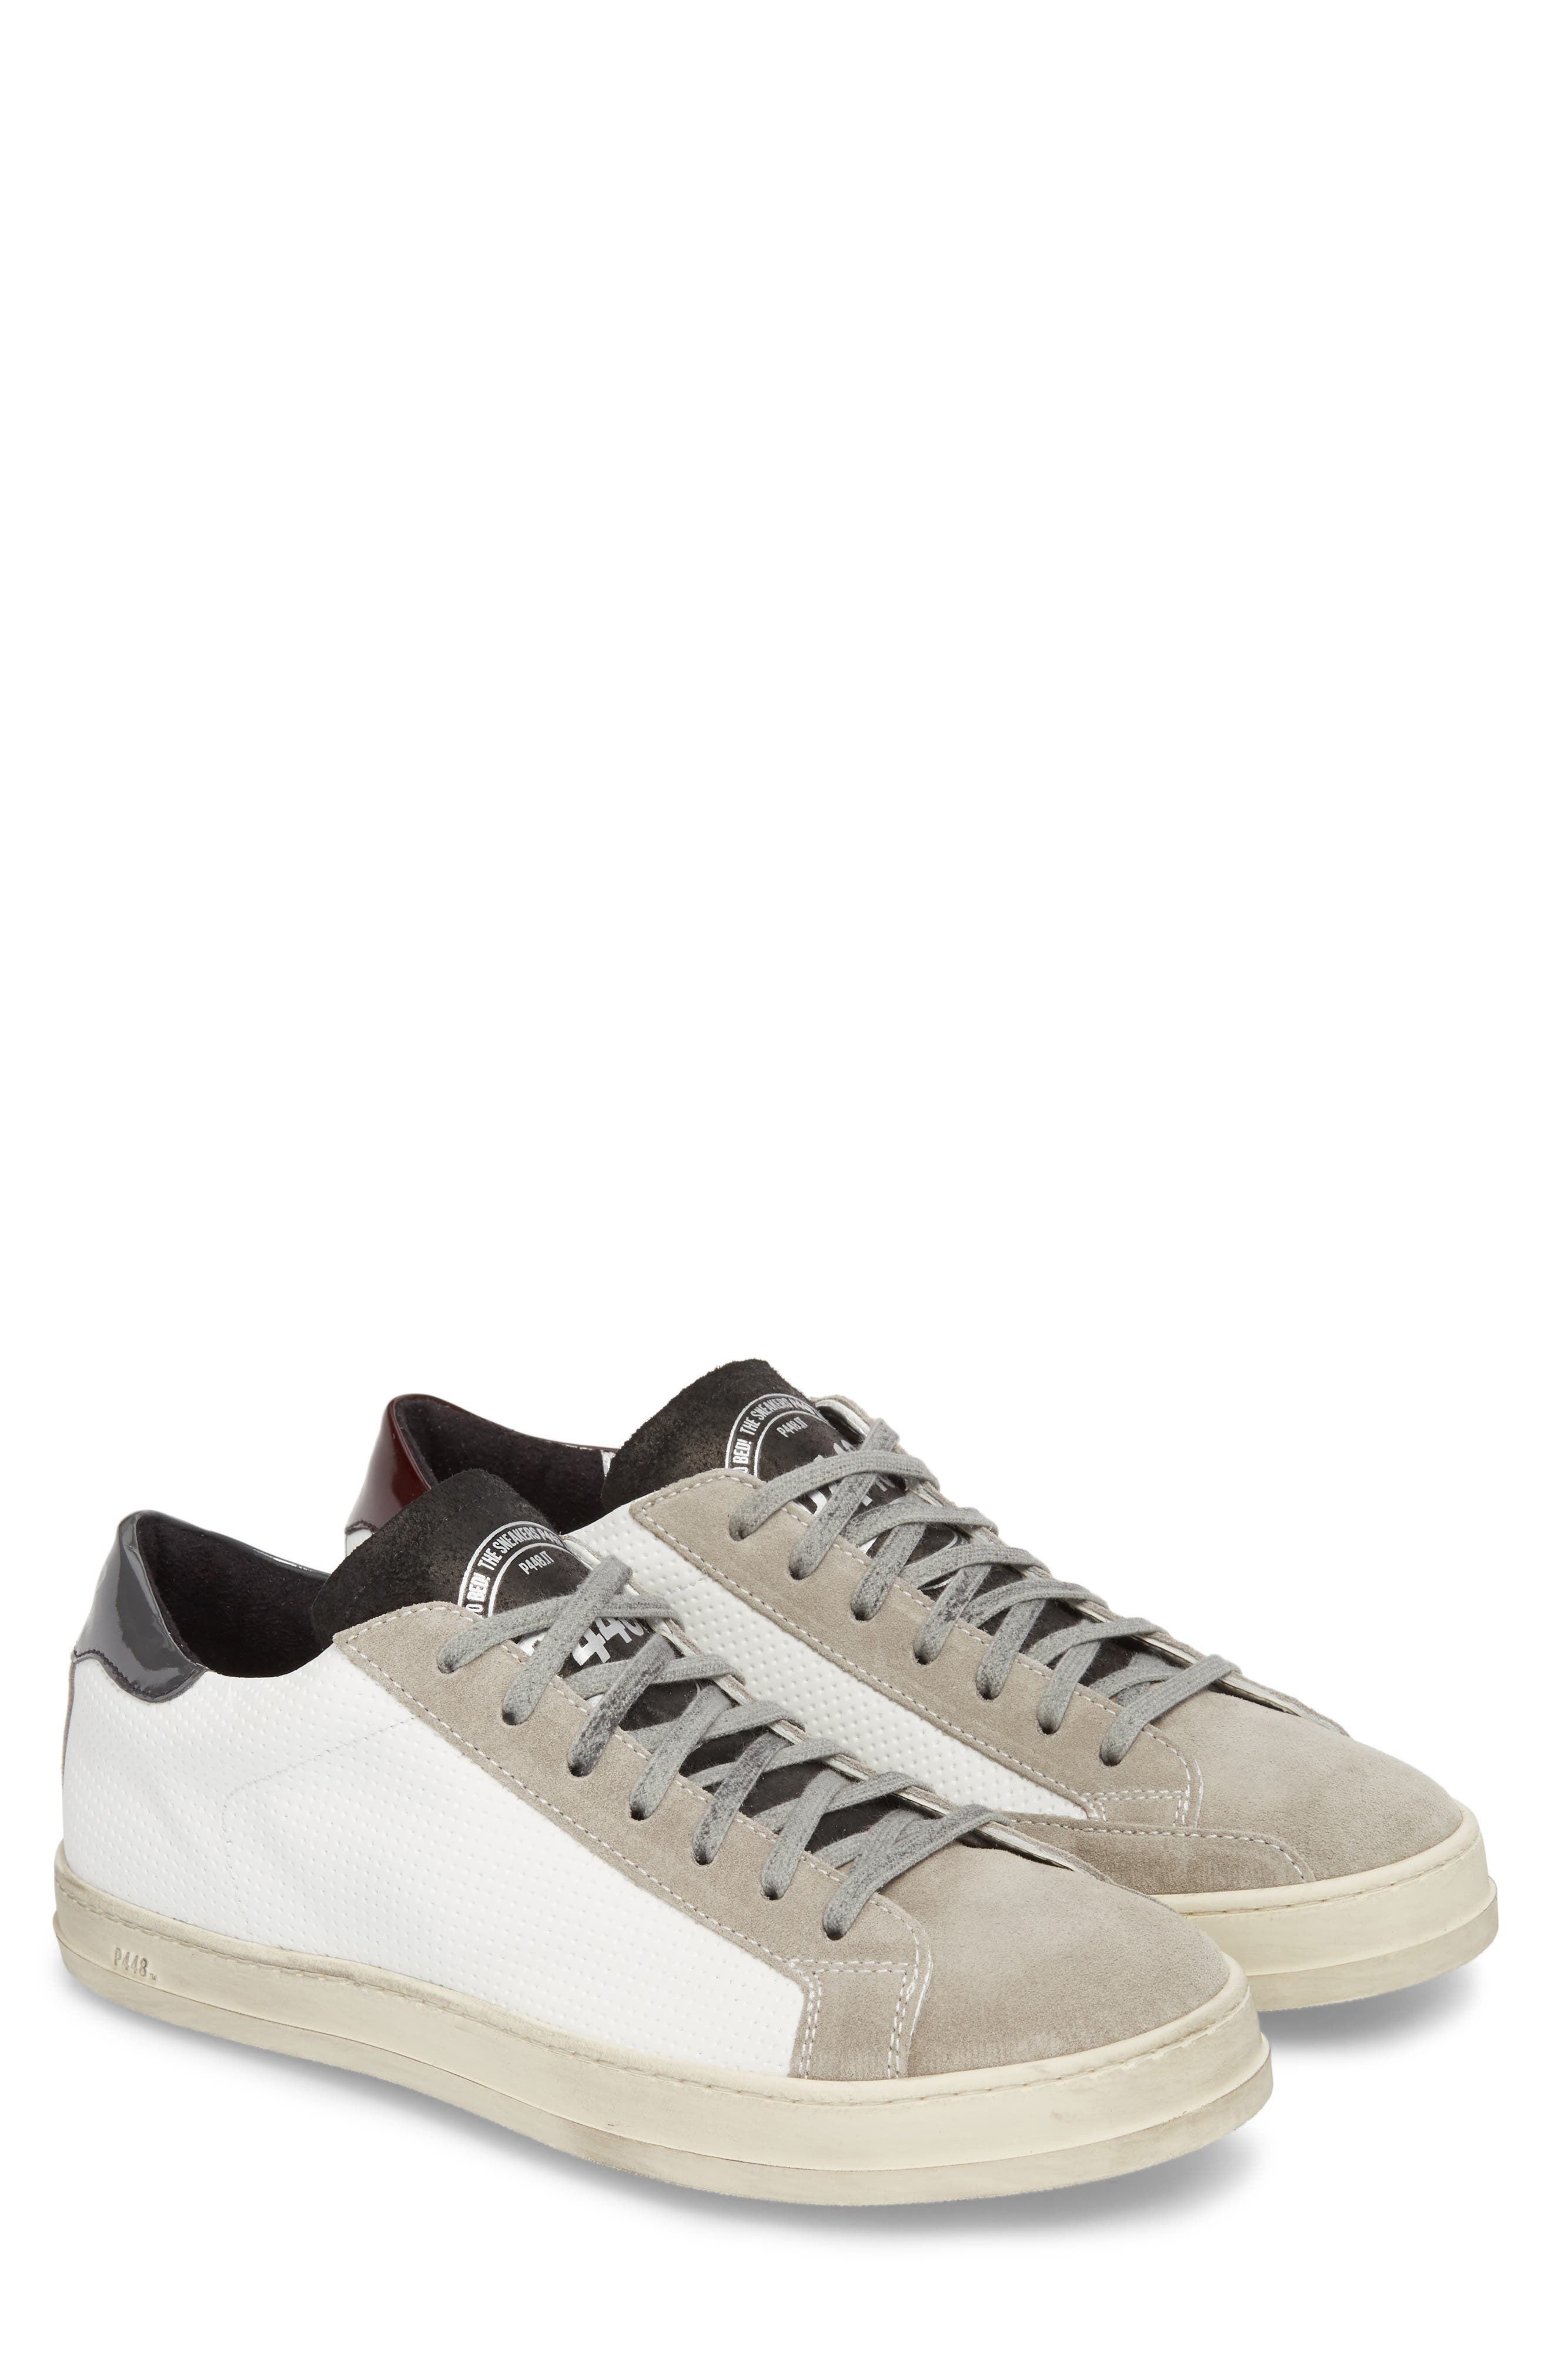 John Mix Low Top Sneaker,                             Alternate thumbnail 2, color,                             100